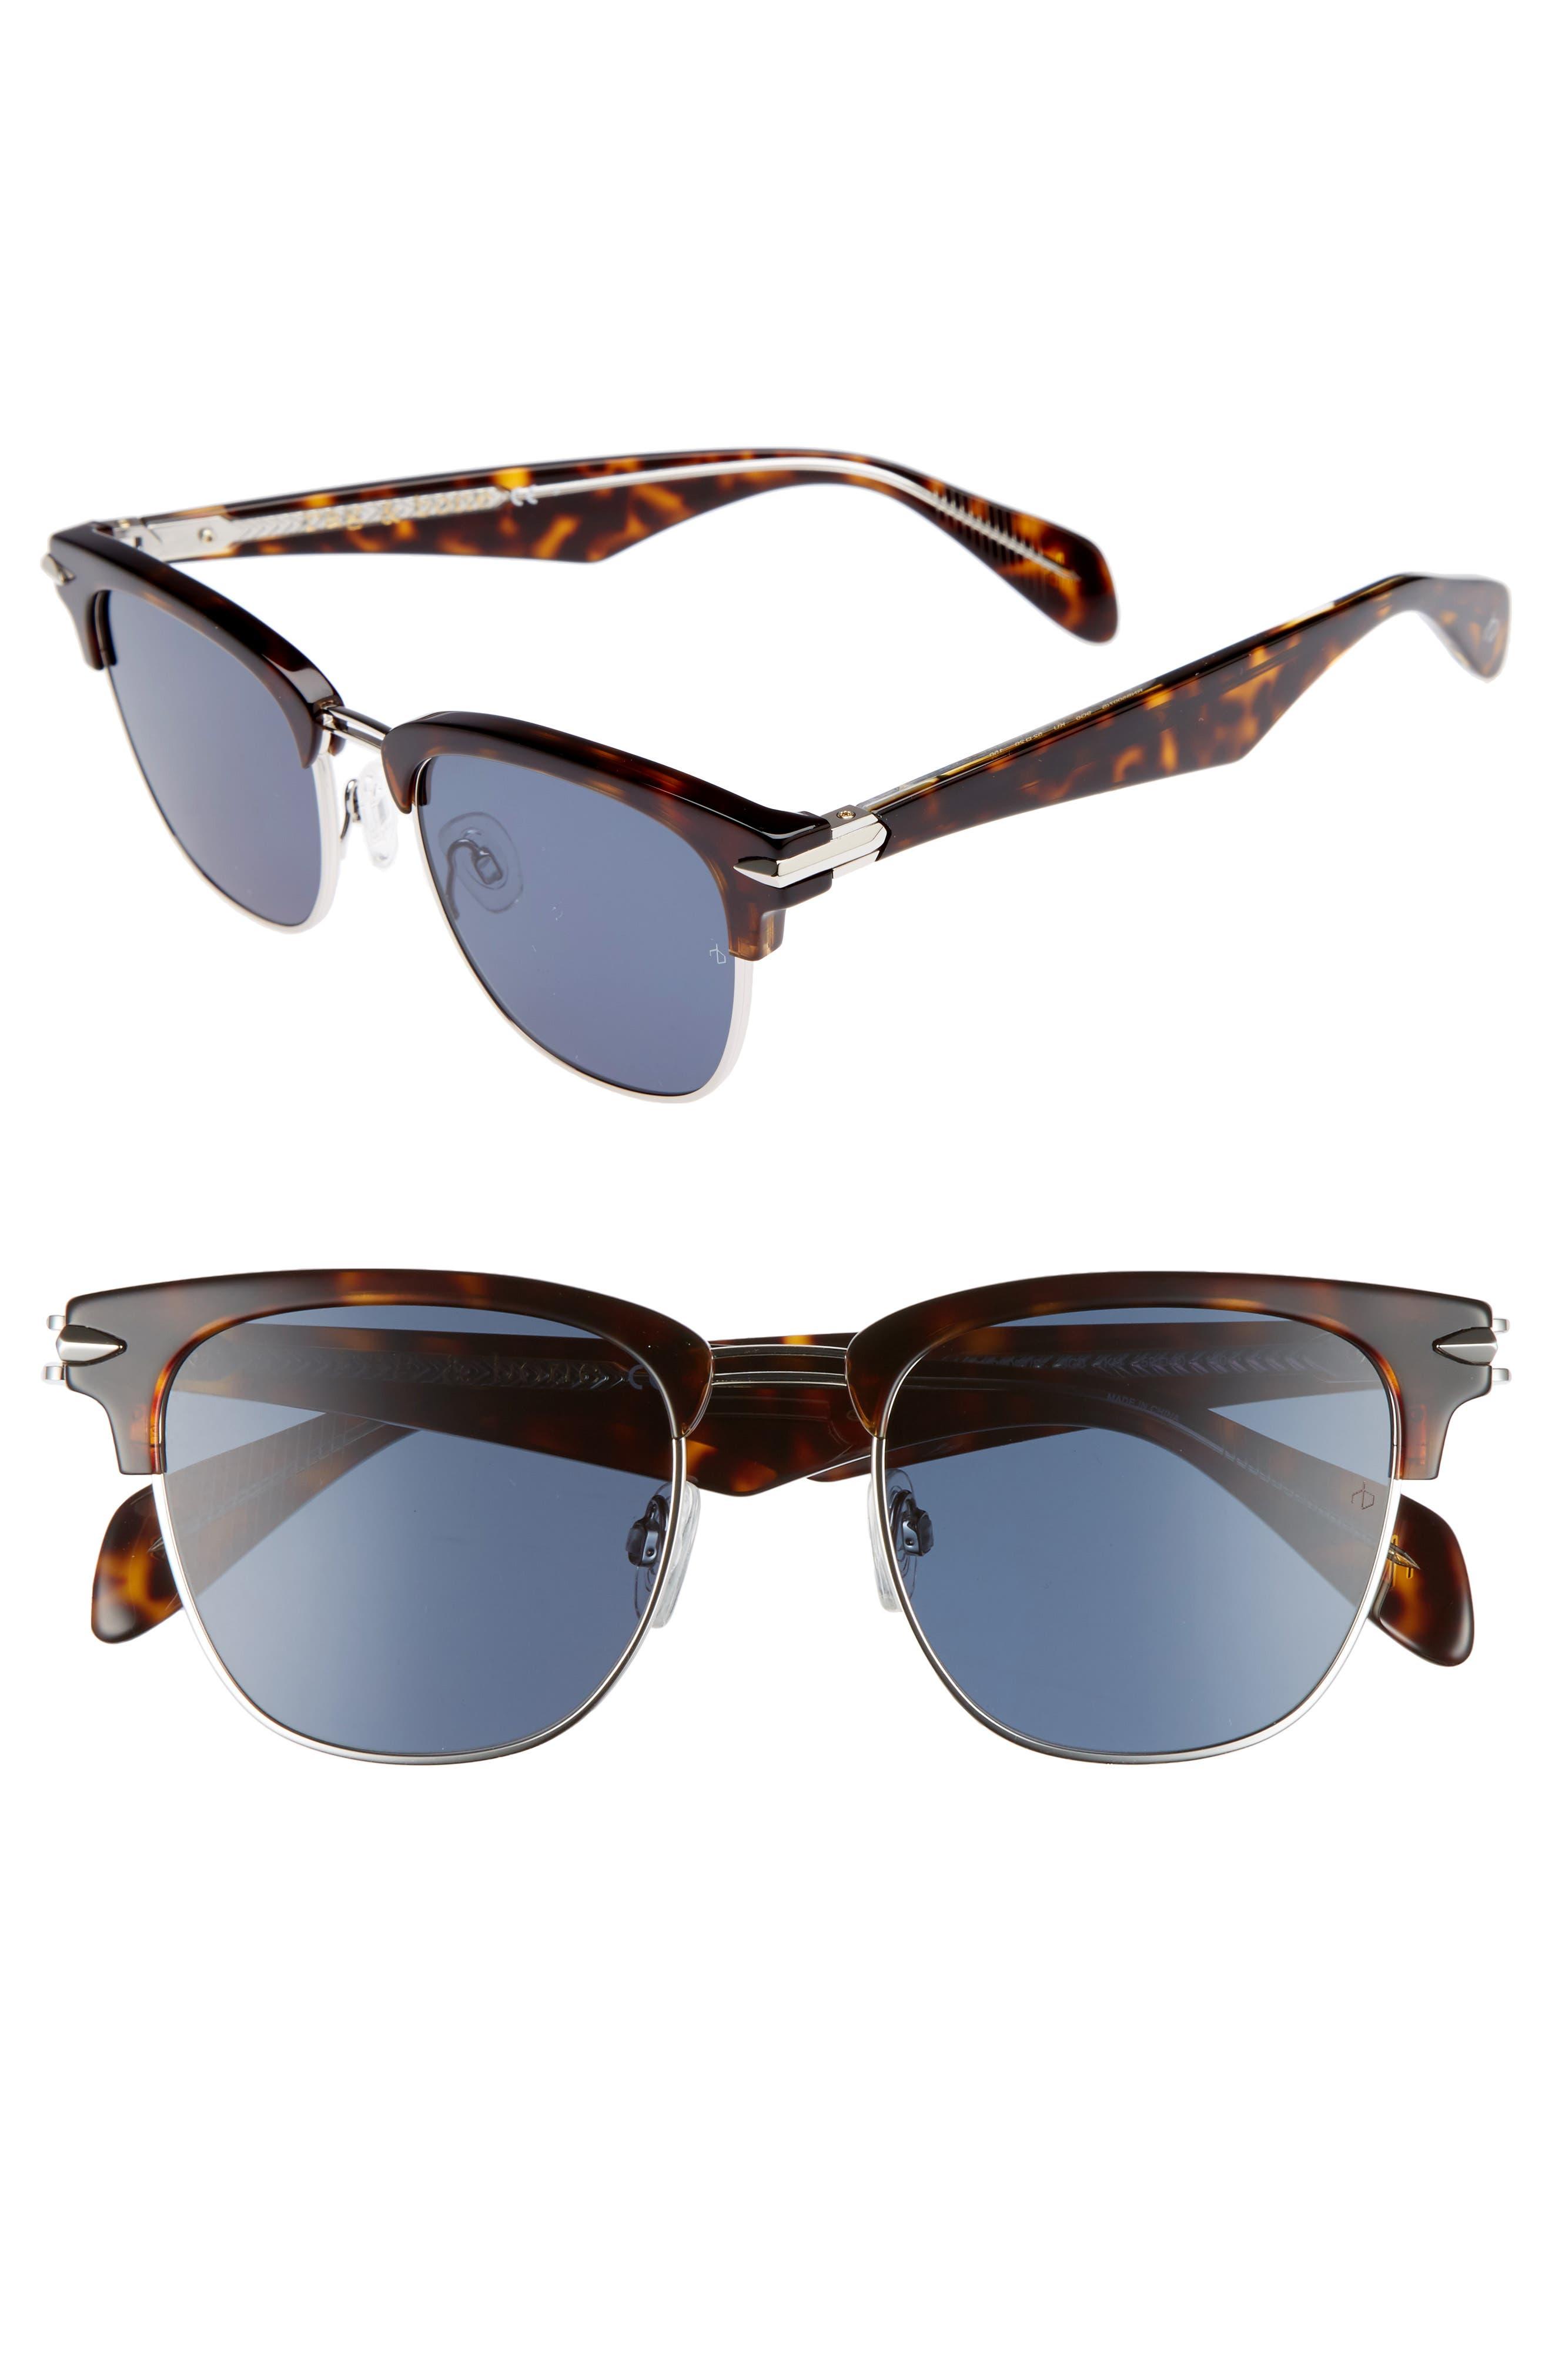 52mm Sunglasses,                             Main thumbnail 1, color,                             Havana Palladium